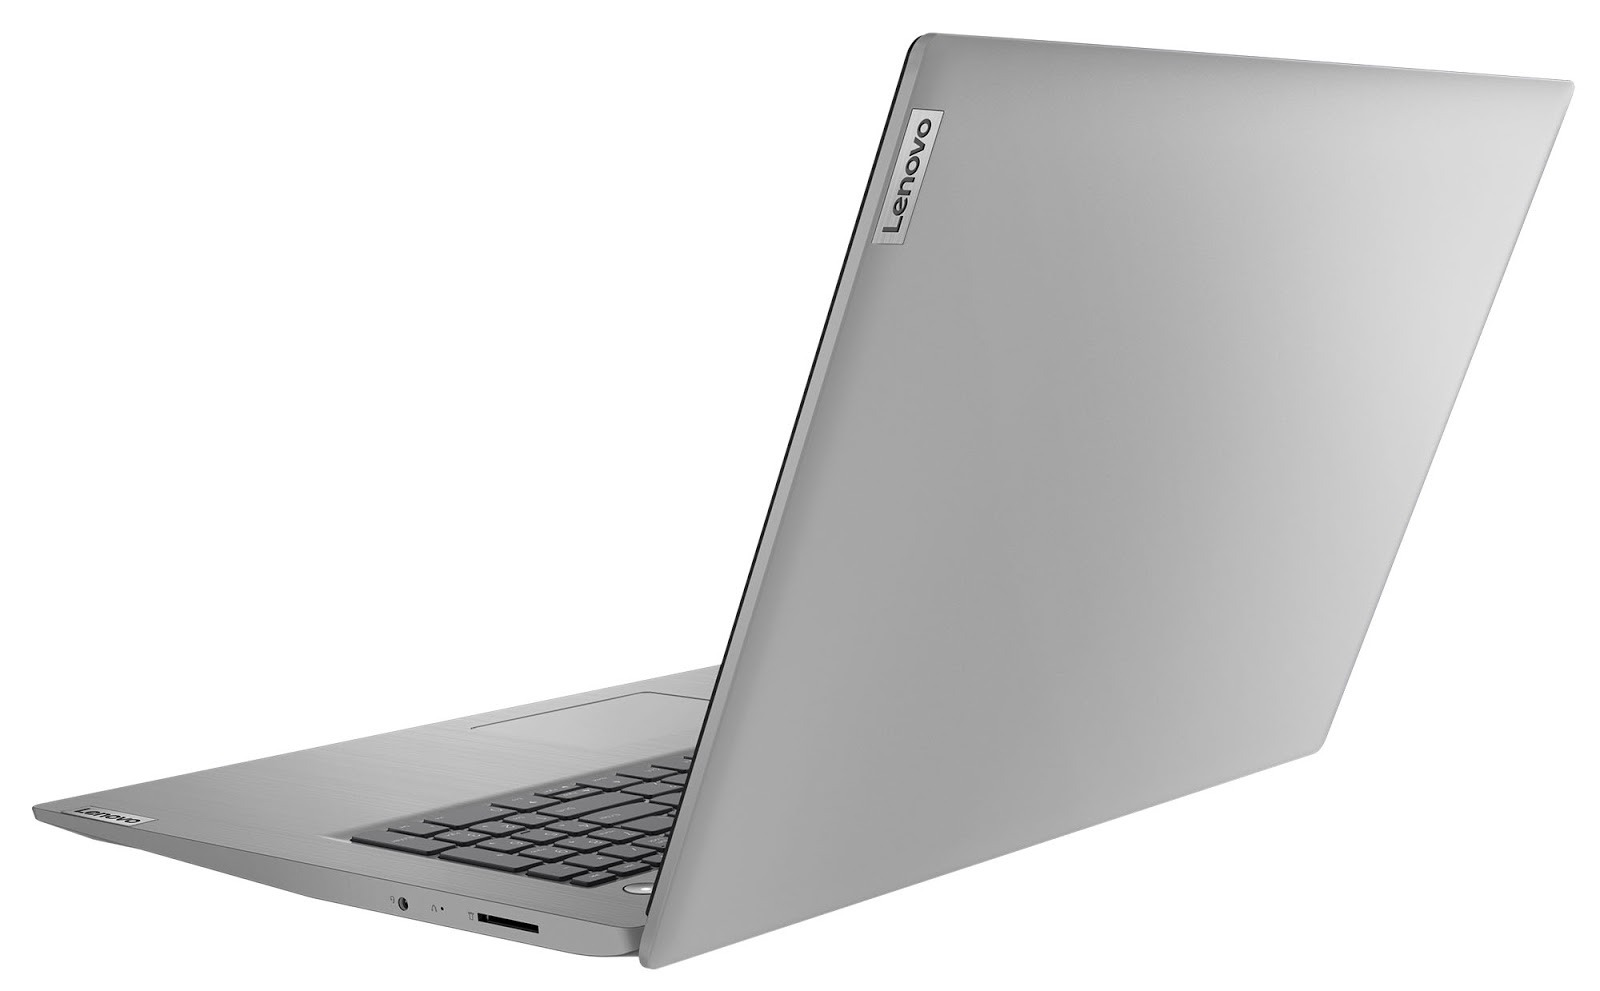 Фото 1. Ноутбук Lenovo ideapad 3 15IML05 Platinum Grey (81WB0076RE)